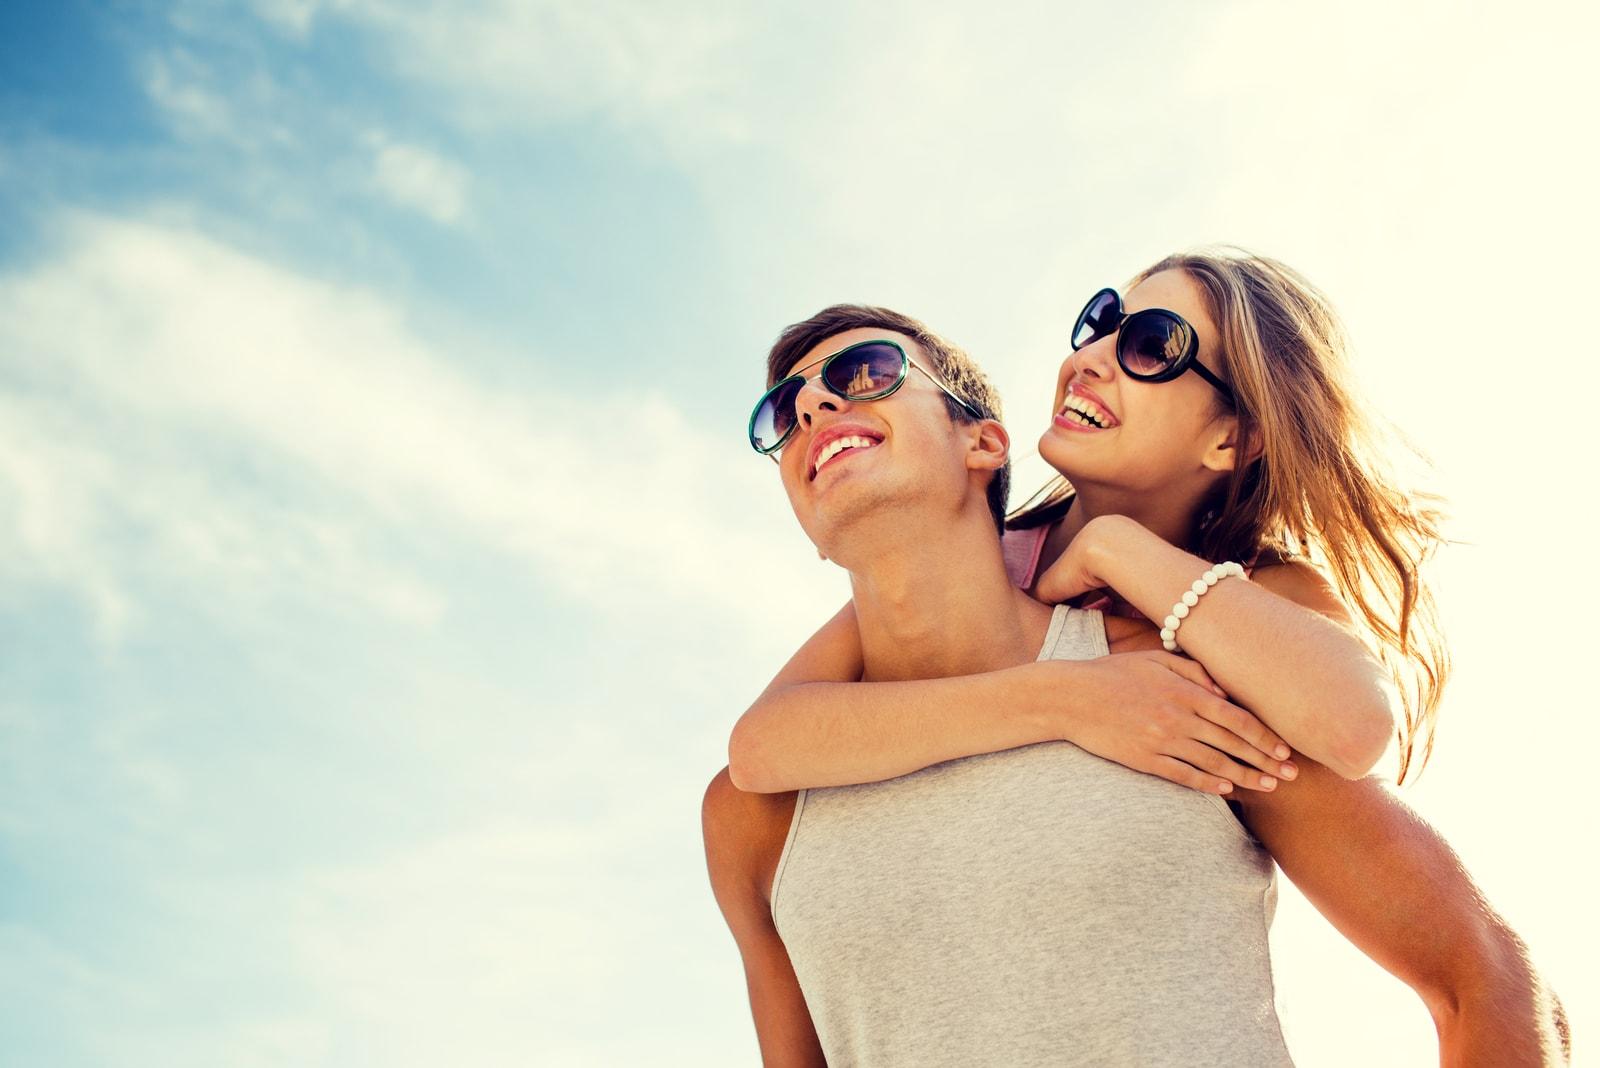 a smiling couple having fun in the sun